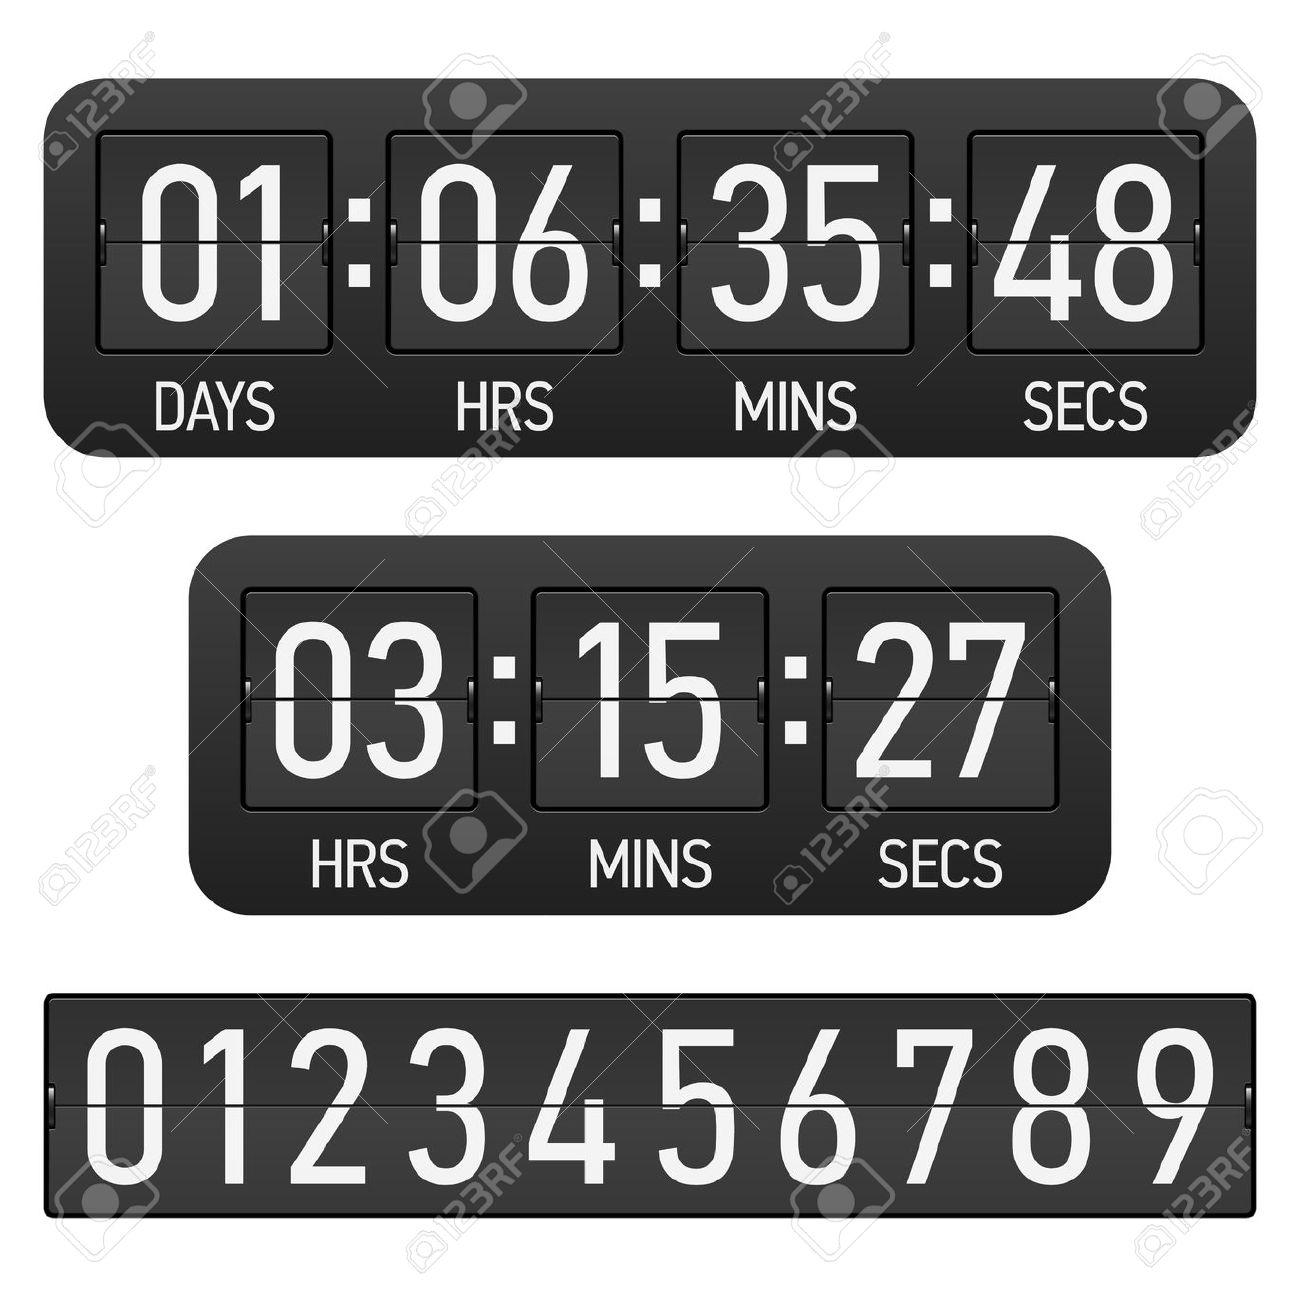 Digital timer clip art. Countdown clock clipart